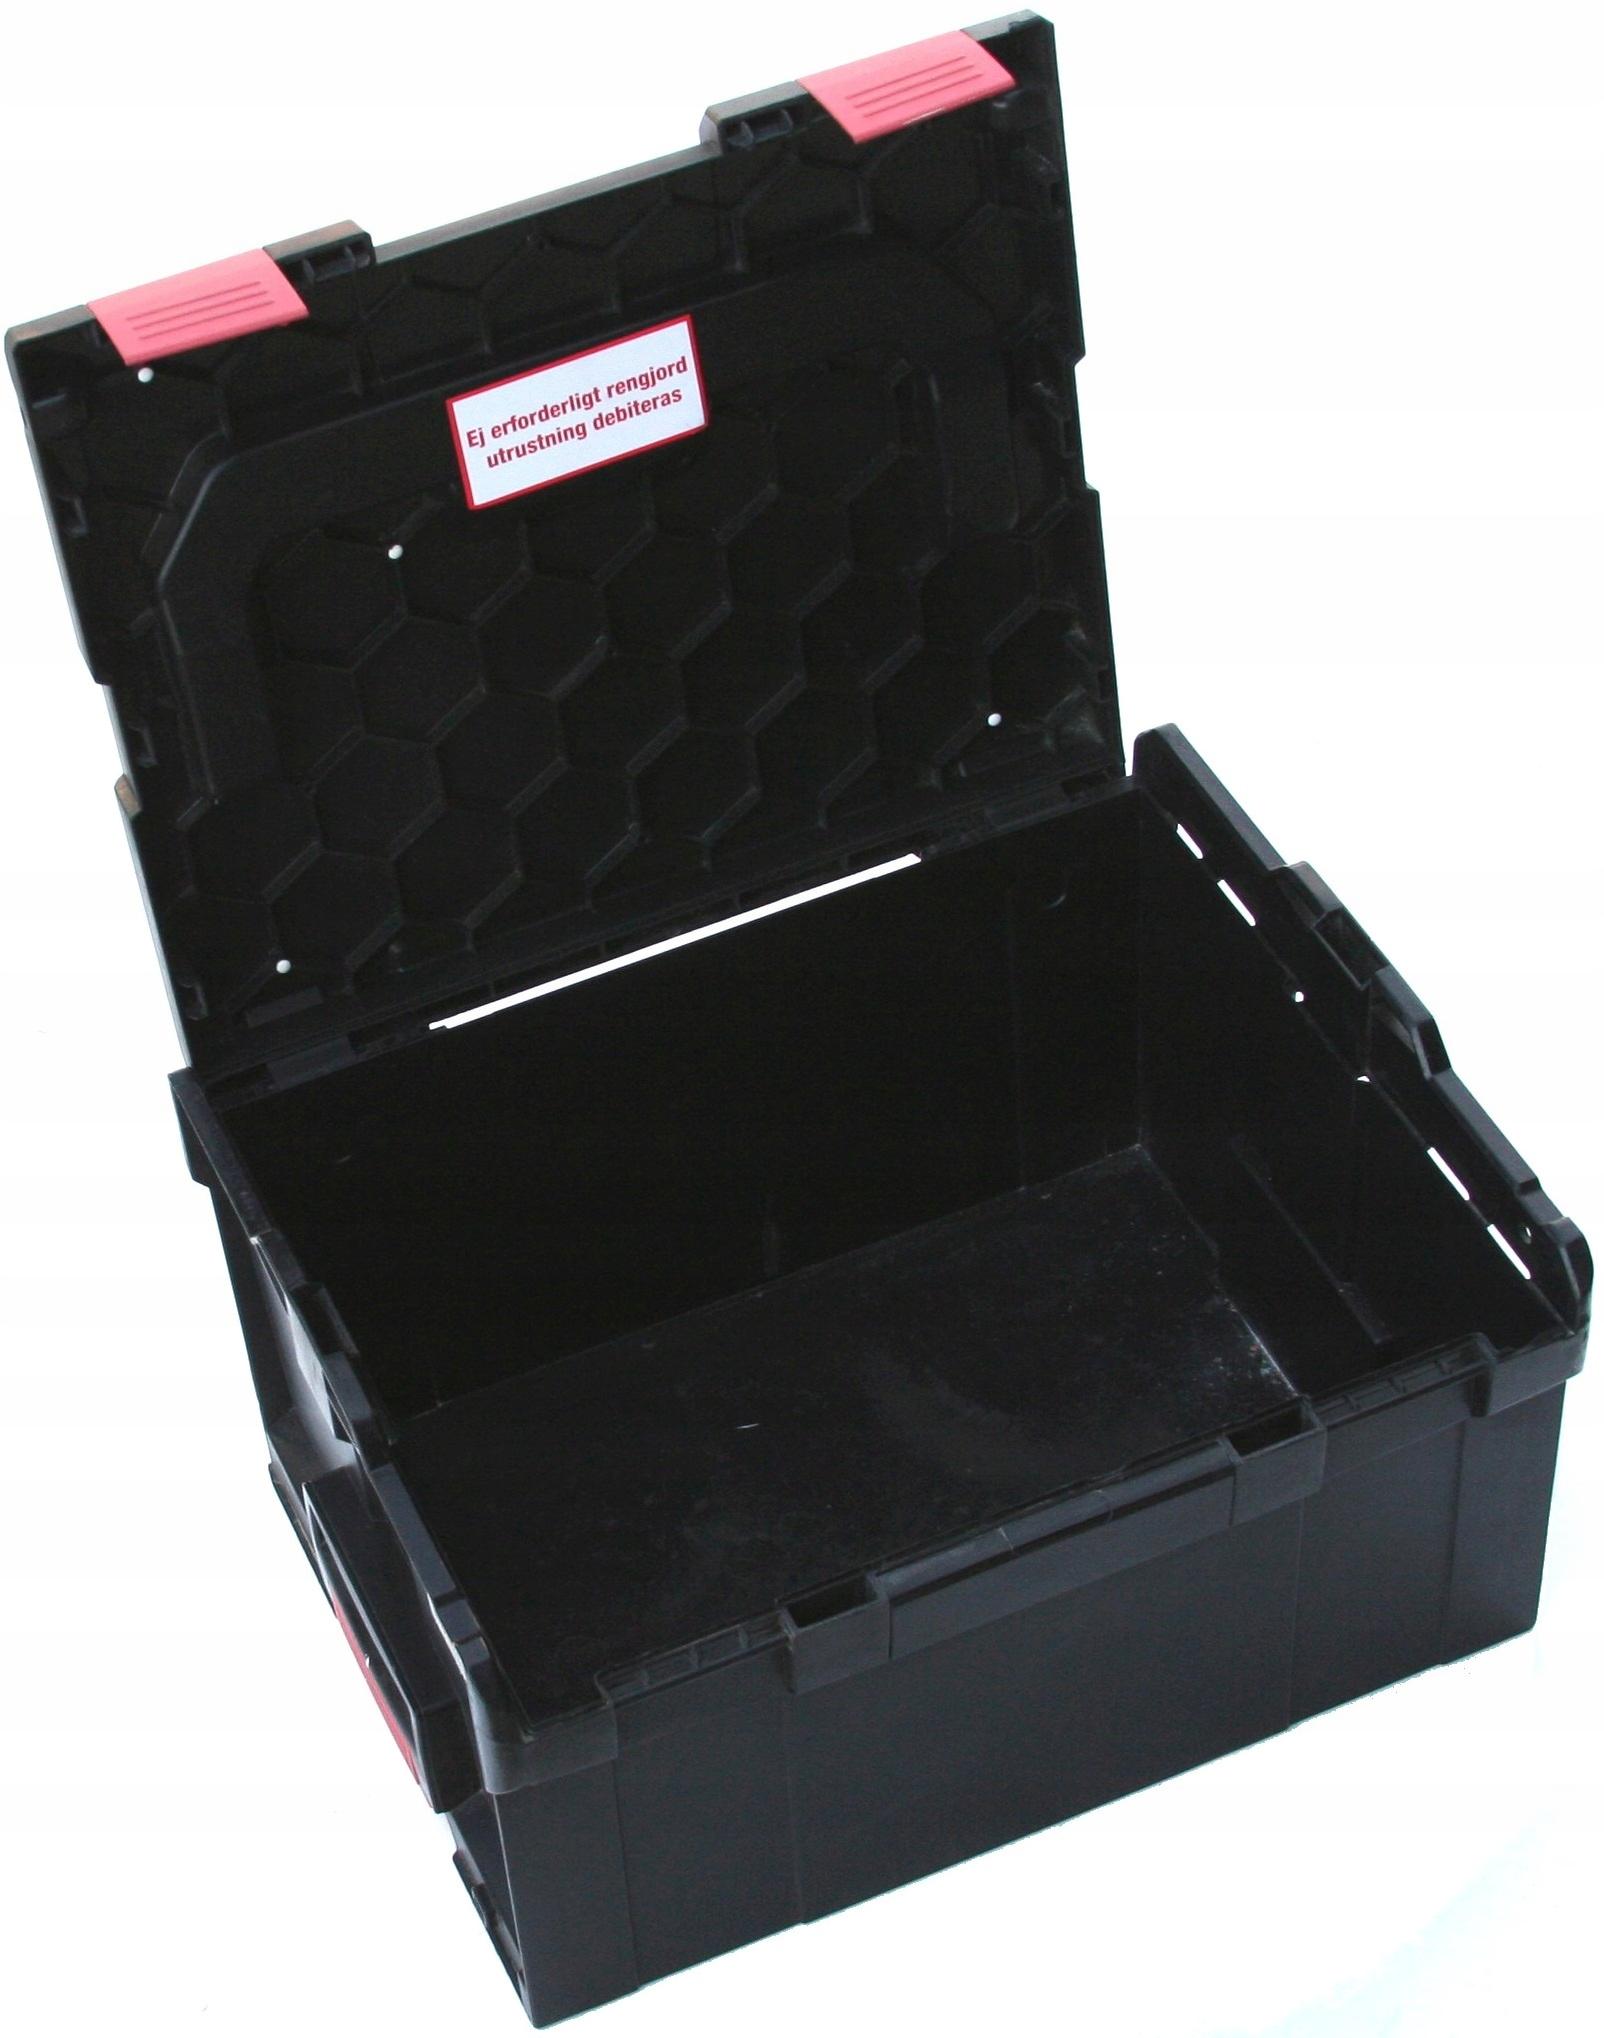 FLEX WALIZKA L-BOXX 238 szlifierka LD 15-10 125R